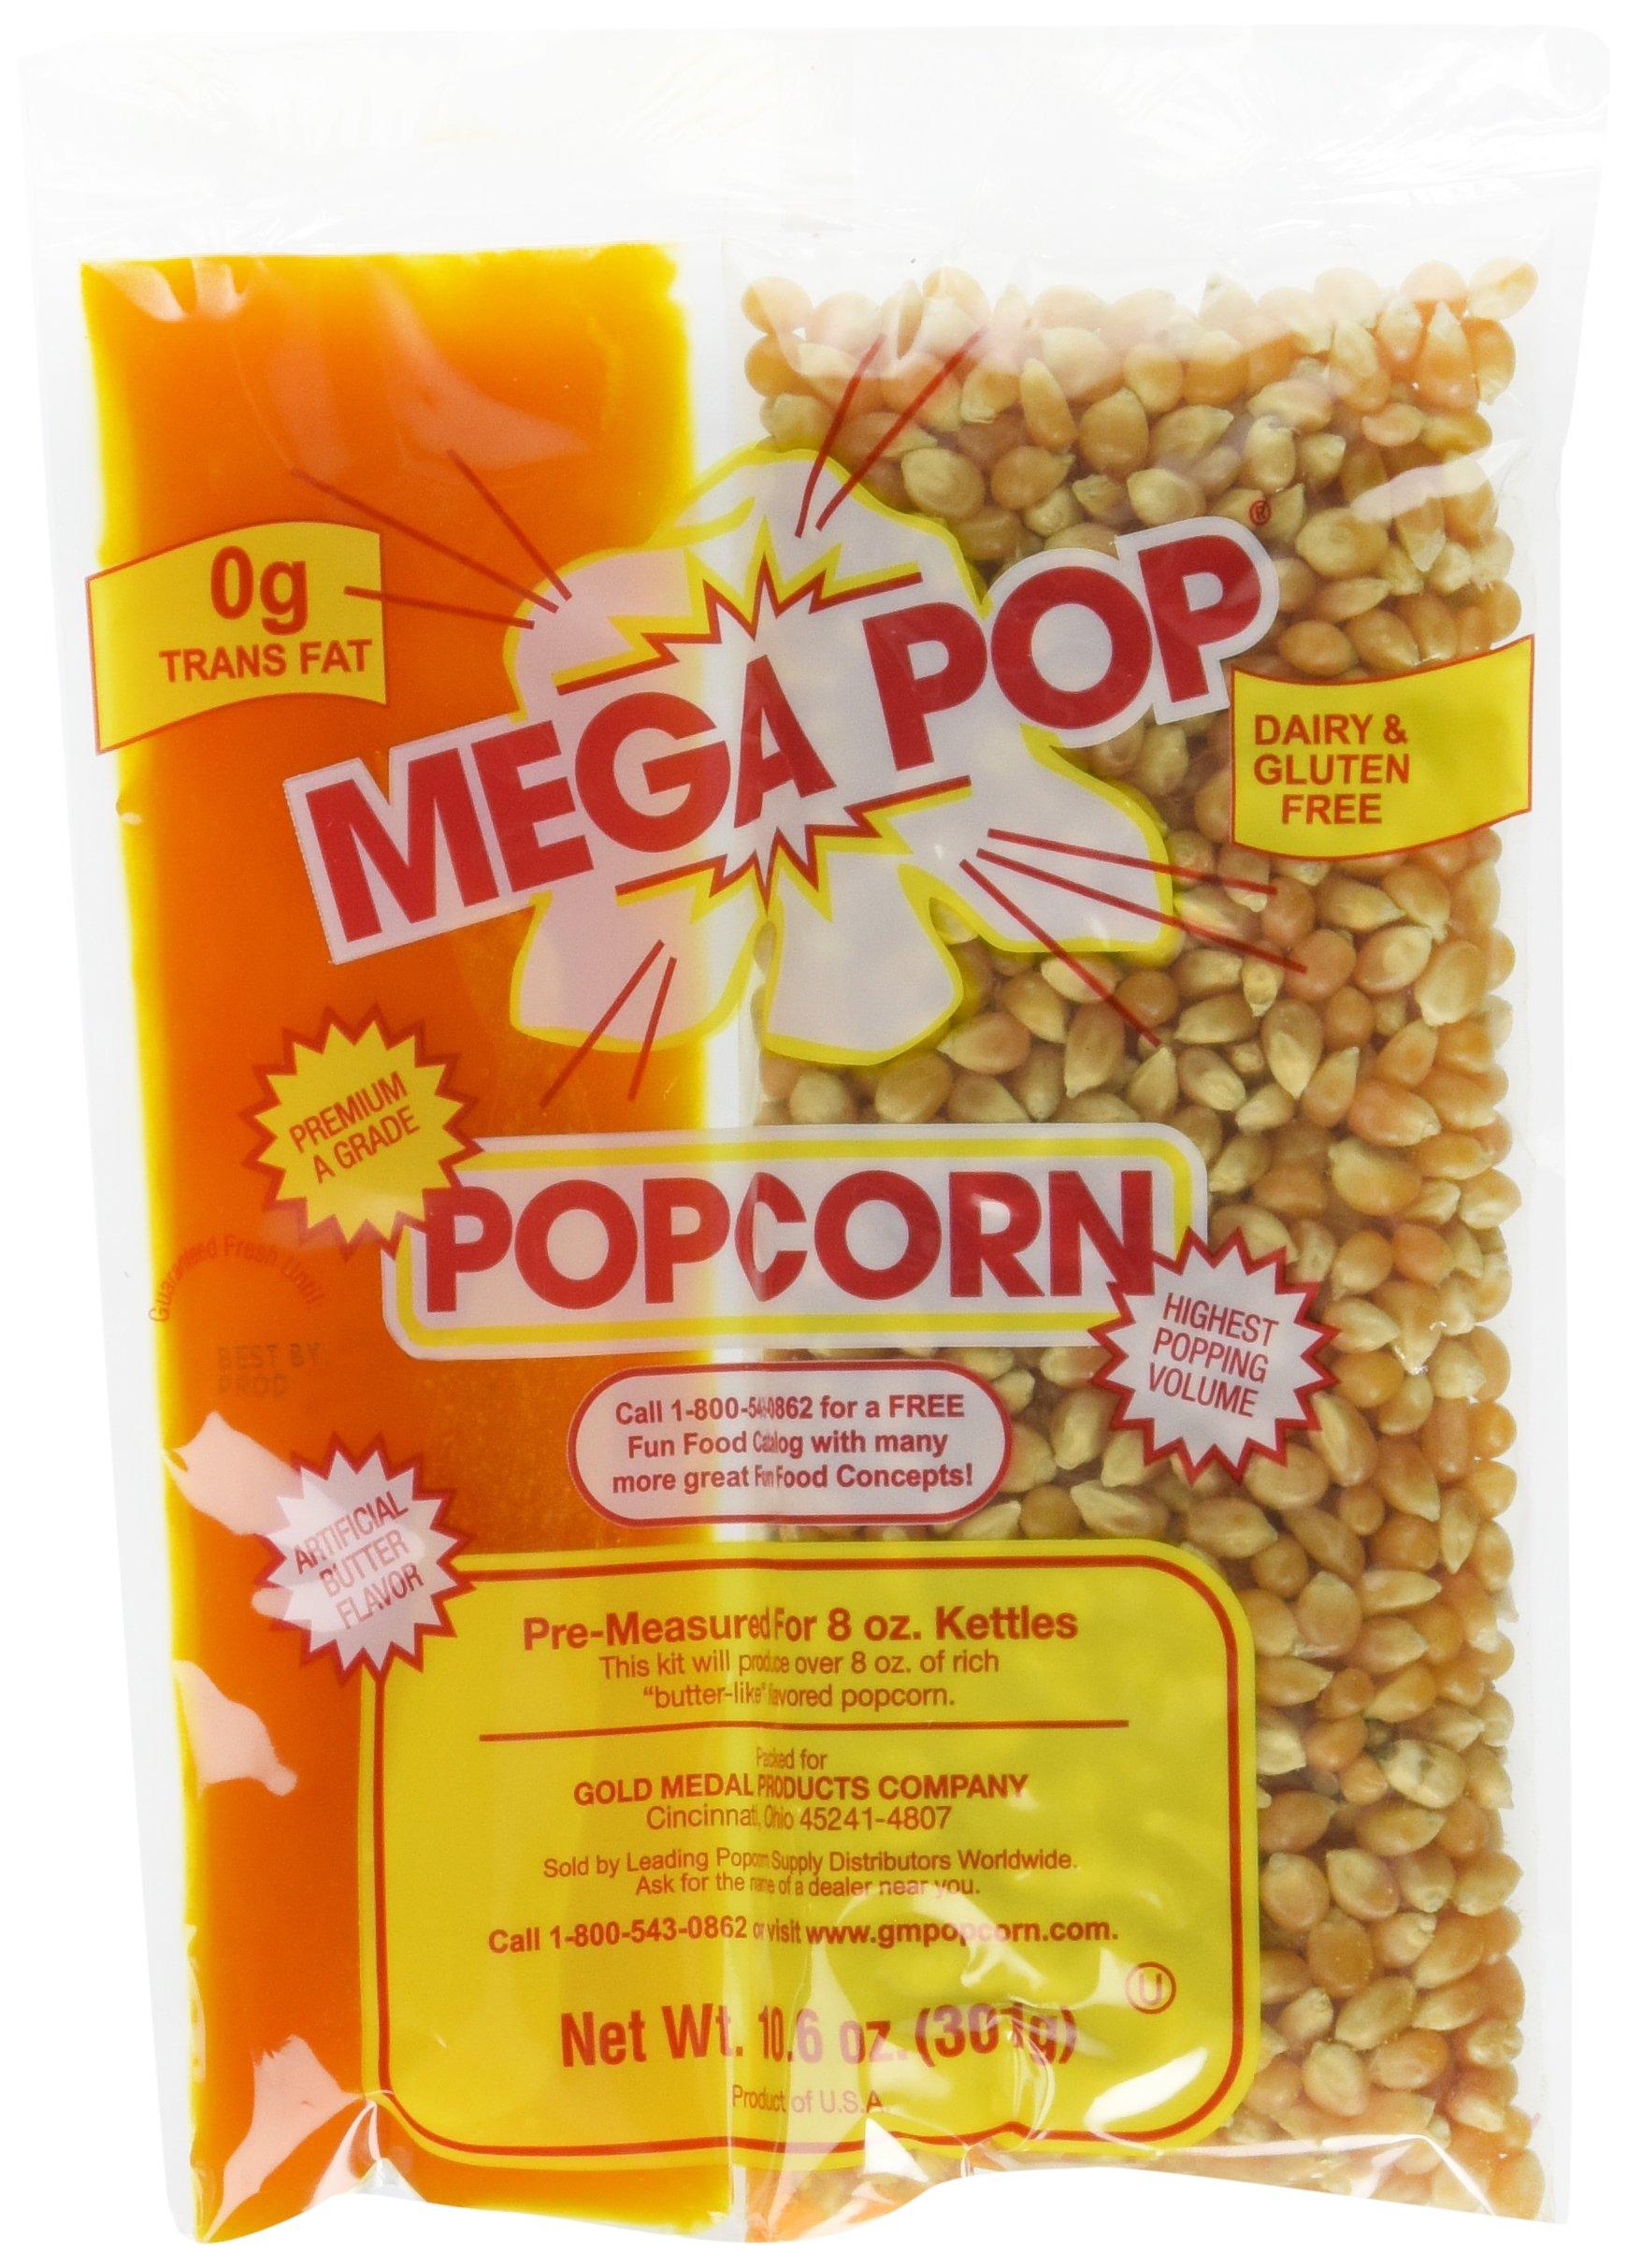 Gold Medal Products Co 24Ct  Coconut Oil Kit 2838 Popcorn (10.6oz of kernels; pre-measured for 8oz kettles)